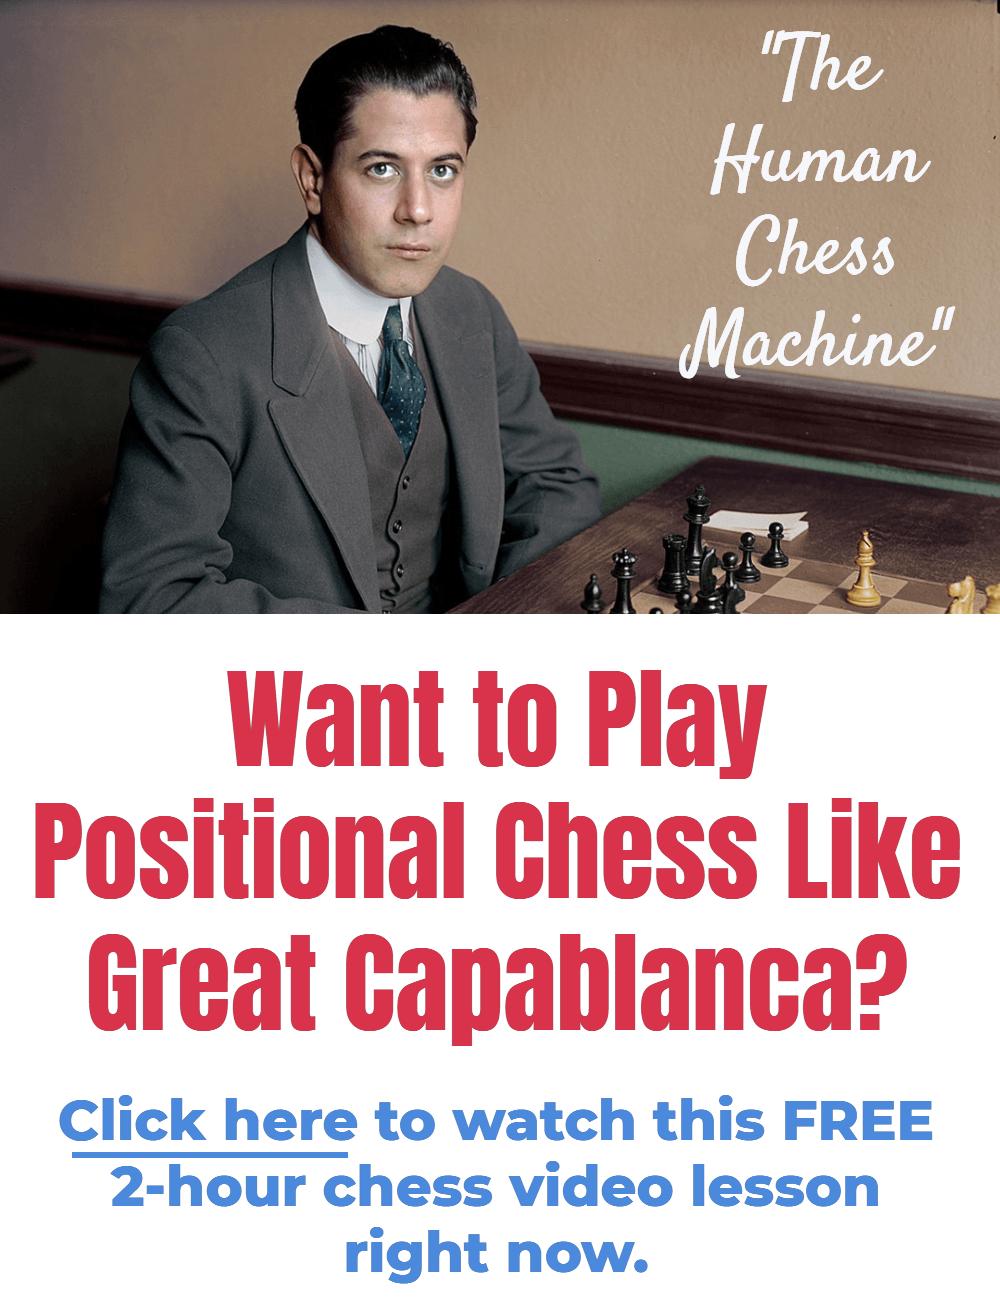 positional chess like capablanca